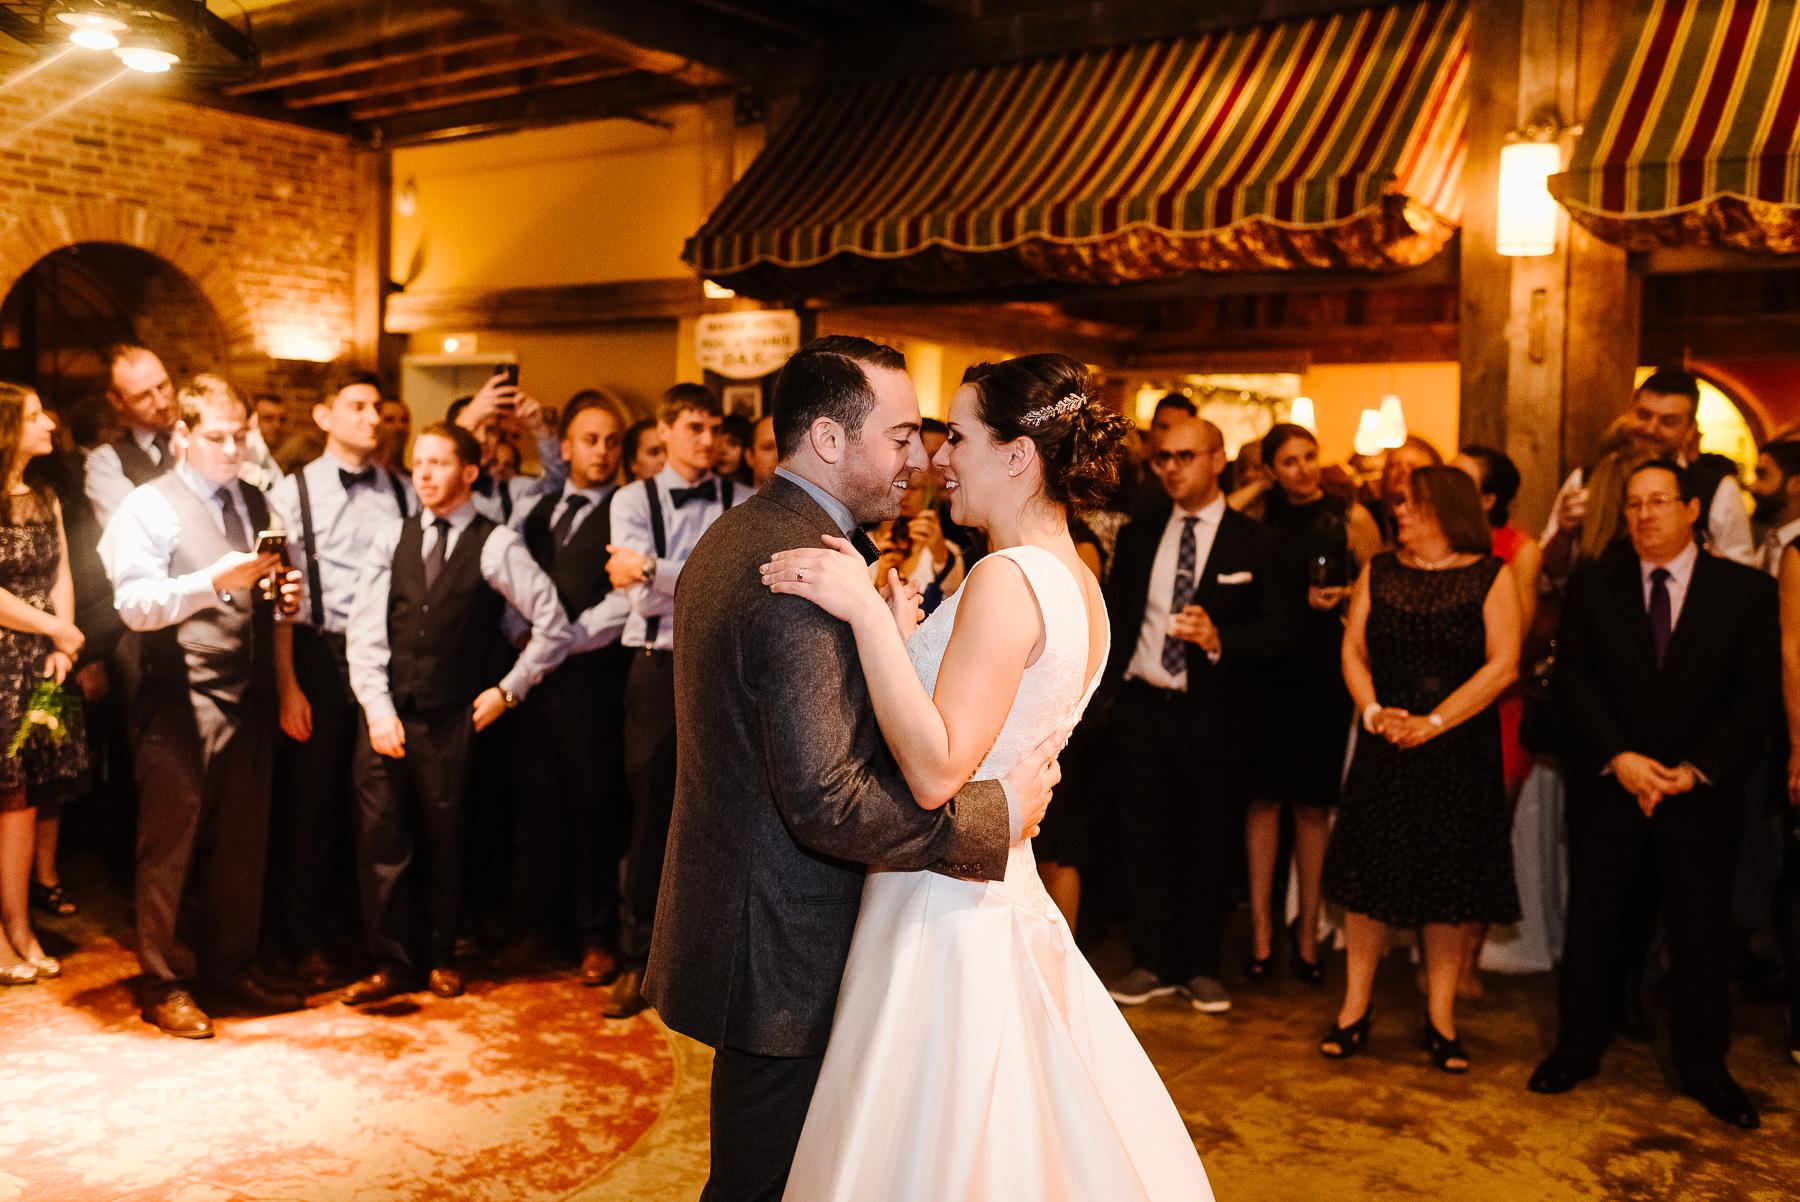 105-Laurita Winery Wedding New Jersey Wedding Photographer Laurita Winery Weddings Longbrook Photography.jpg